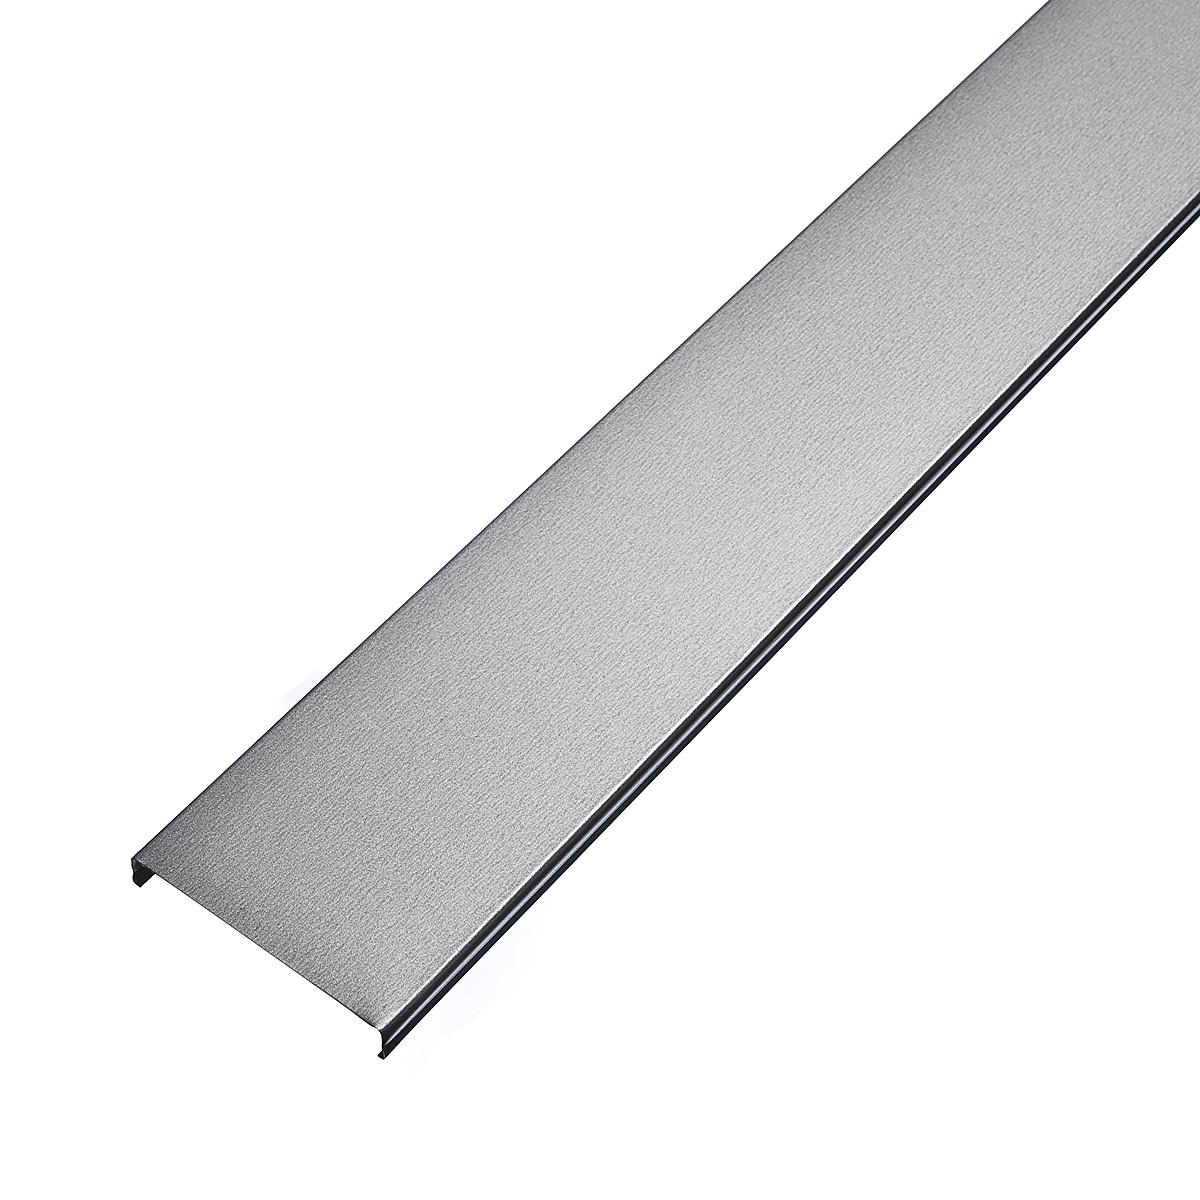 Рейка открытого типа AN 85А 4м серебристый металлик